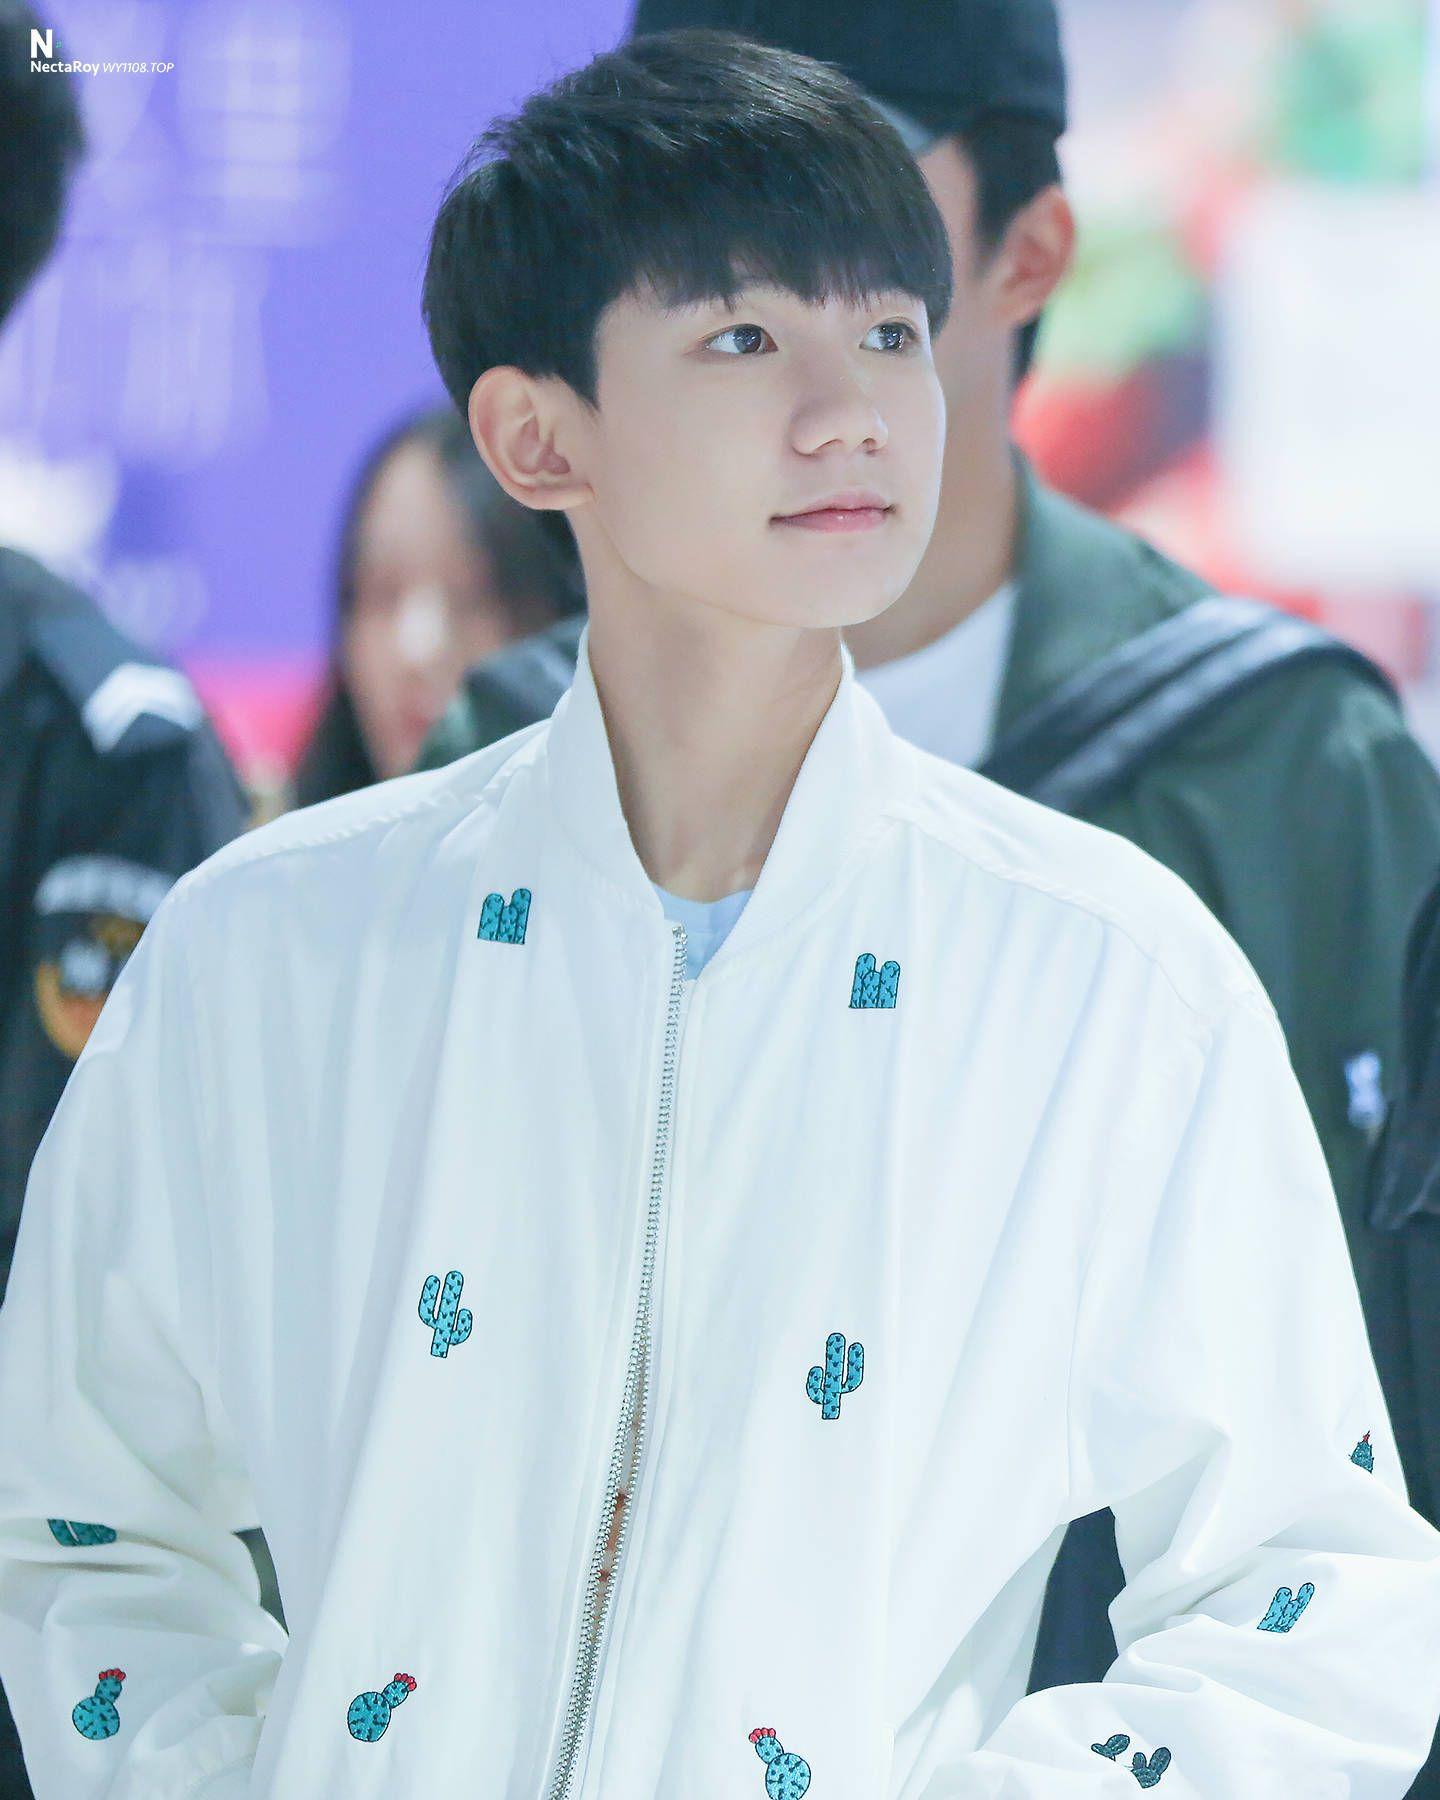 Wangyuan #WY #roy #王源 #หวังหยวน #tfboys #boyhood